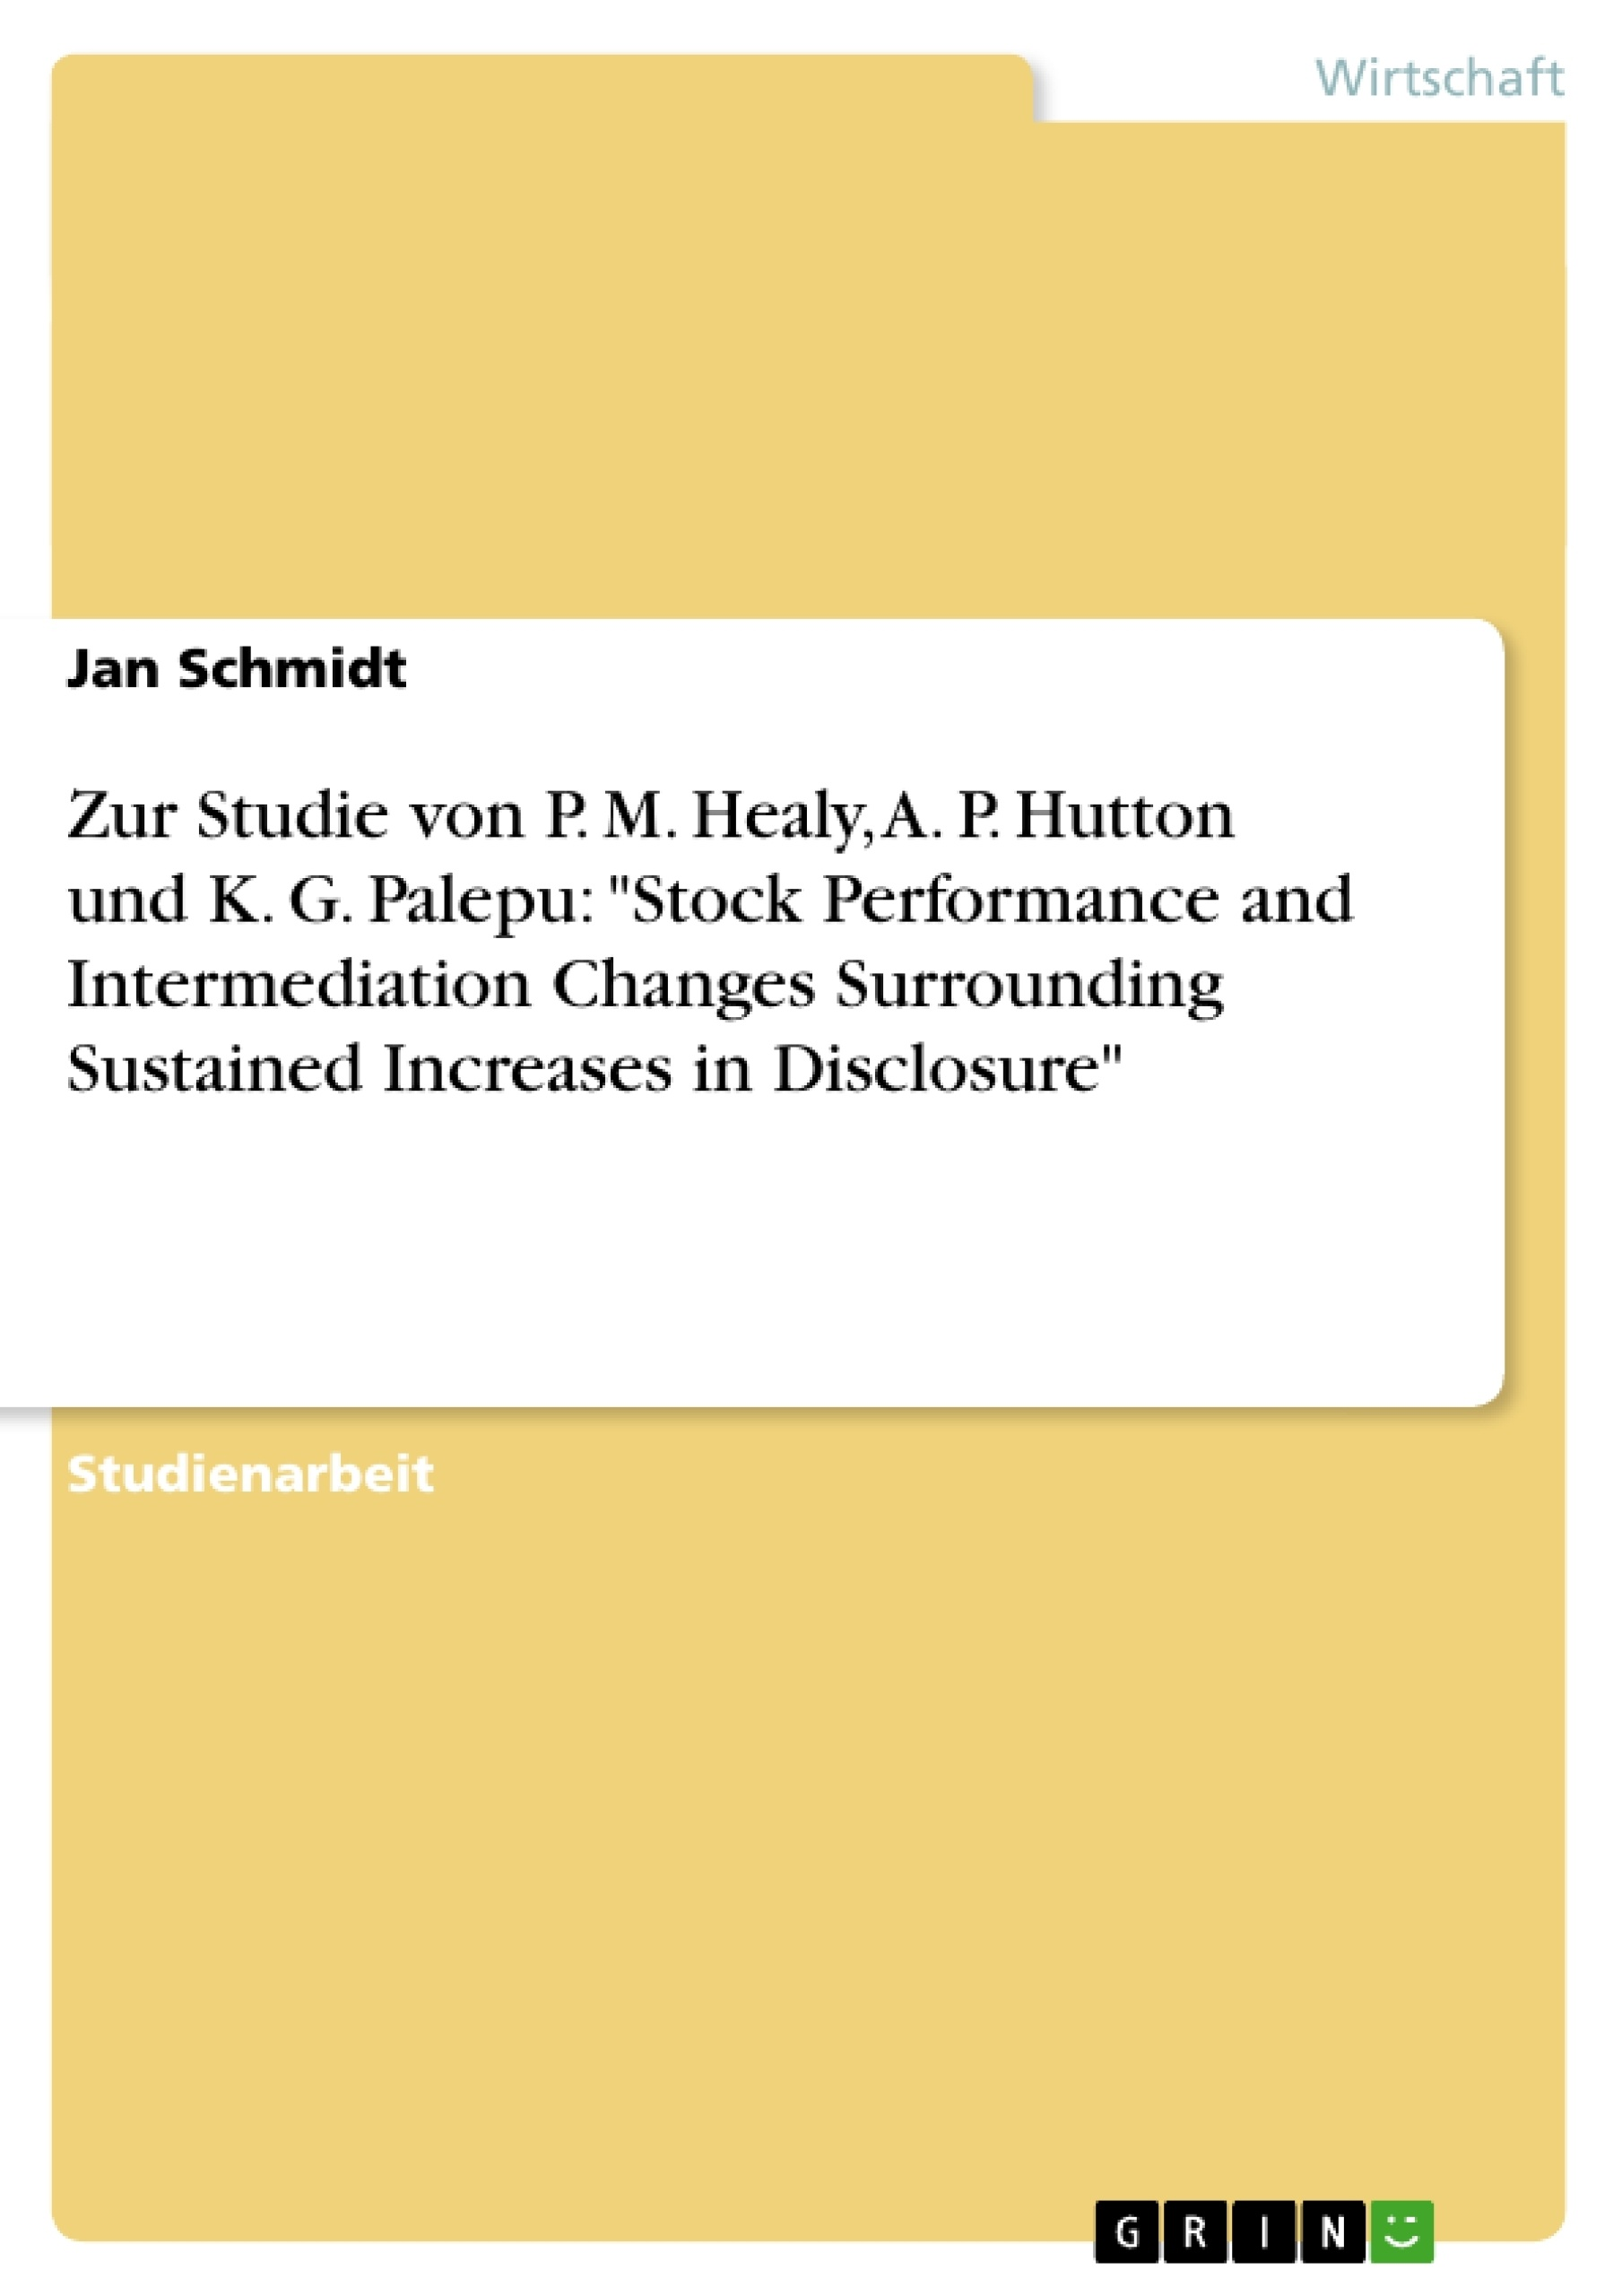 "Titel: Zur Studie von P. M. Healy, A. P. Hutton und K. G. Palepu: ""Stock Performance and Intermediation Changes Surrounding Sustained Increases in Disclosure"""